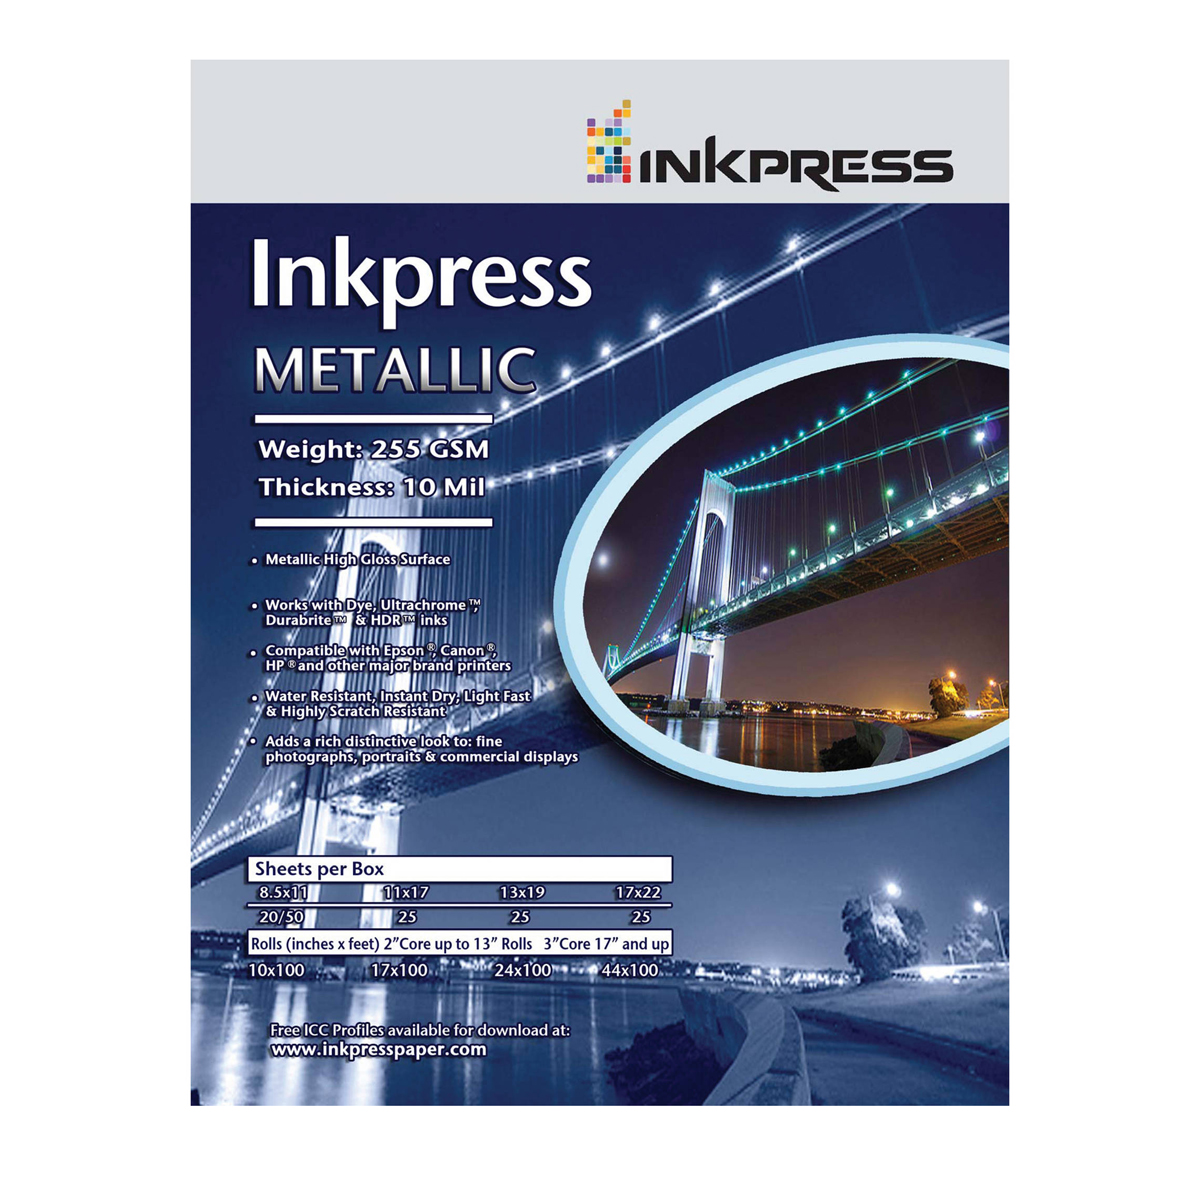 Image of Inkpress 8.5 x 11in Metallic Photo Paper (50 Sheets)